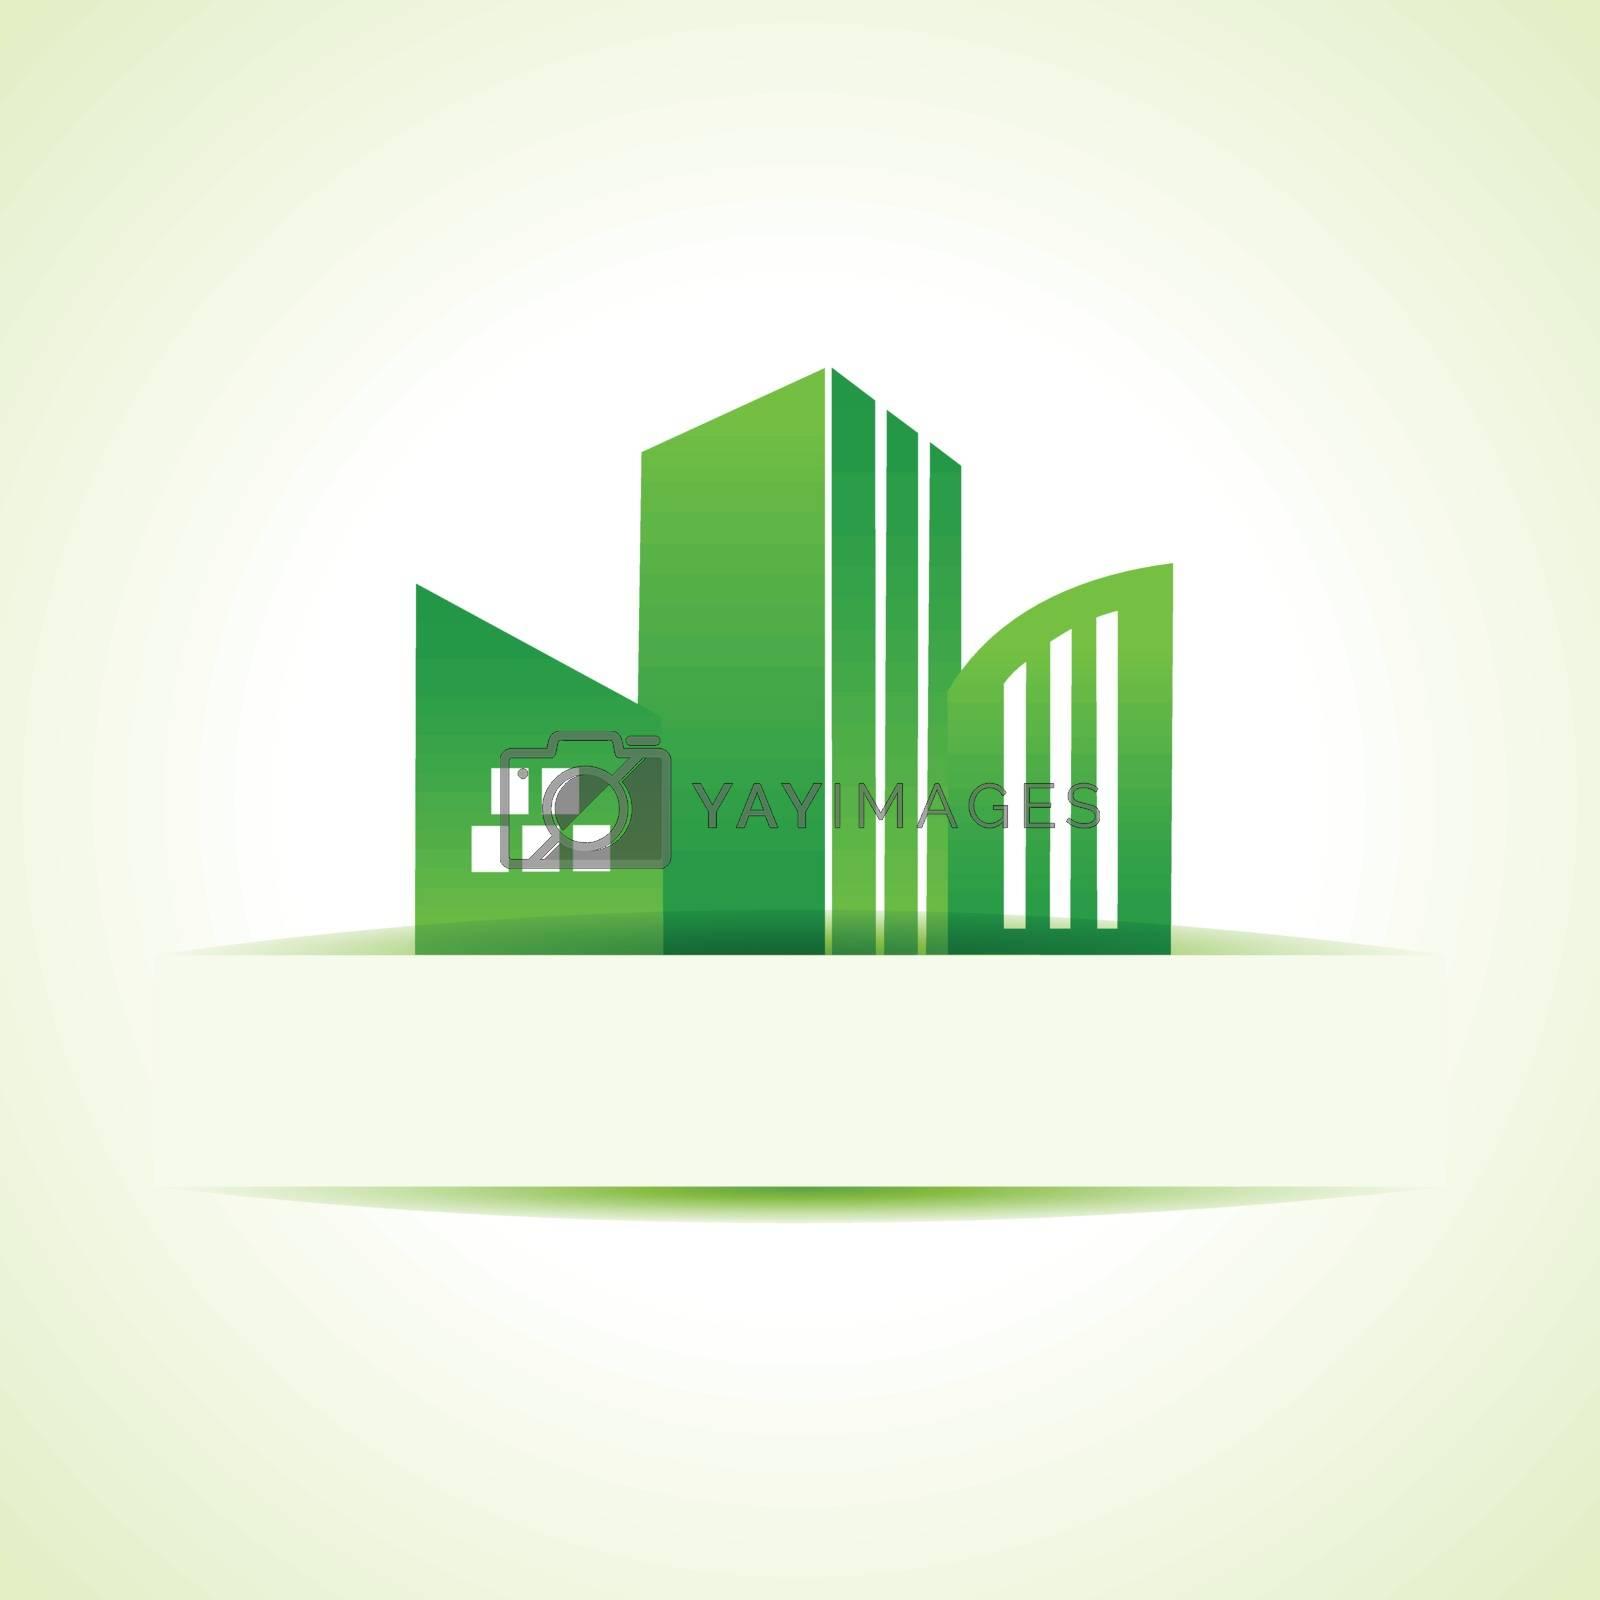 Abstract eco real estate design stock vector